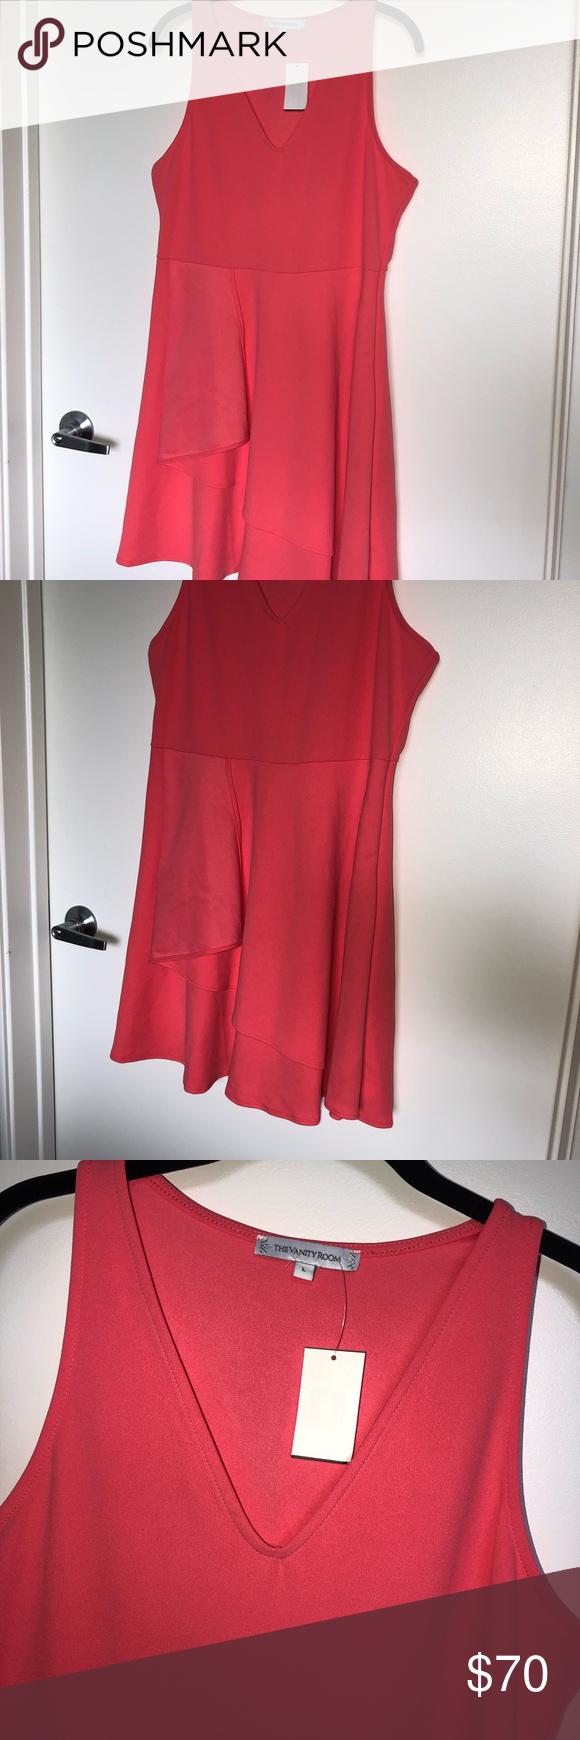 The Vanity Room Dres Brand Dresses Custom Paraphrase Clothing